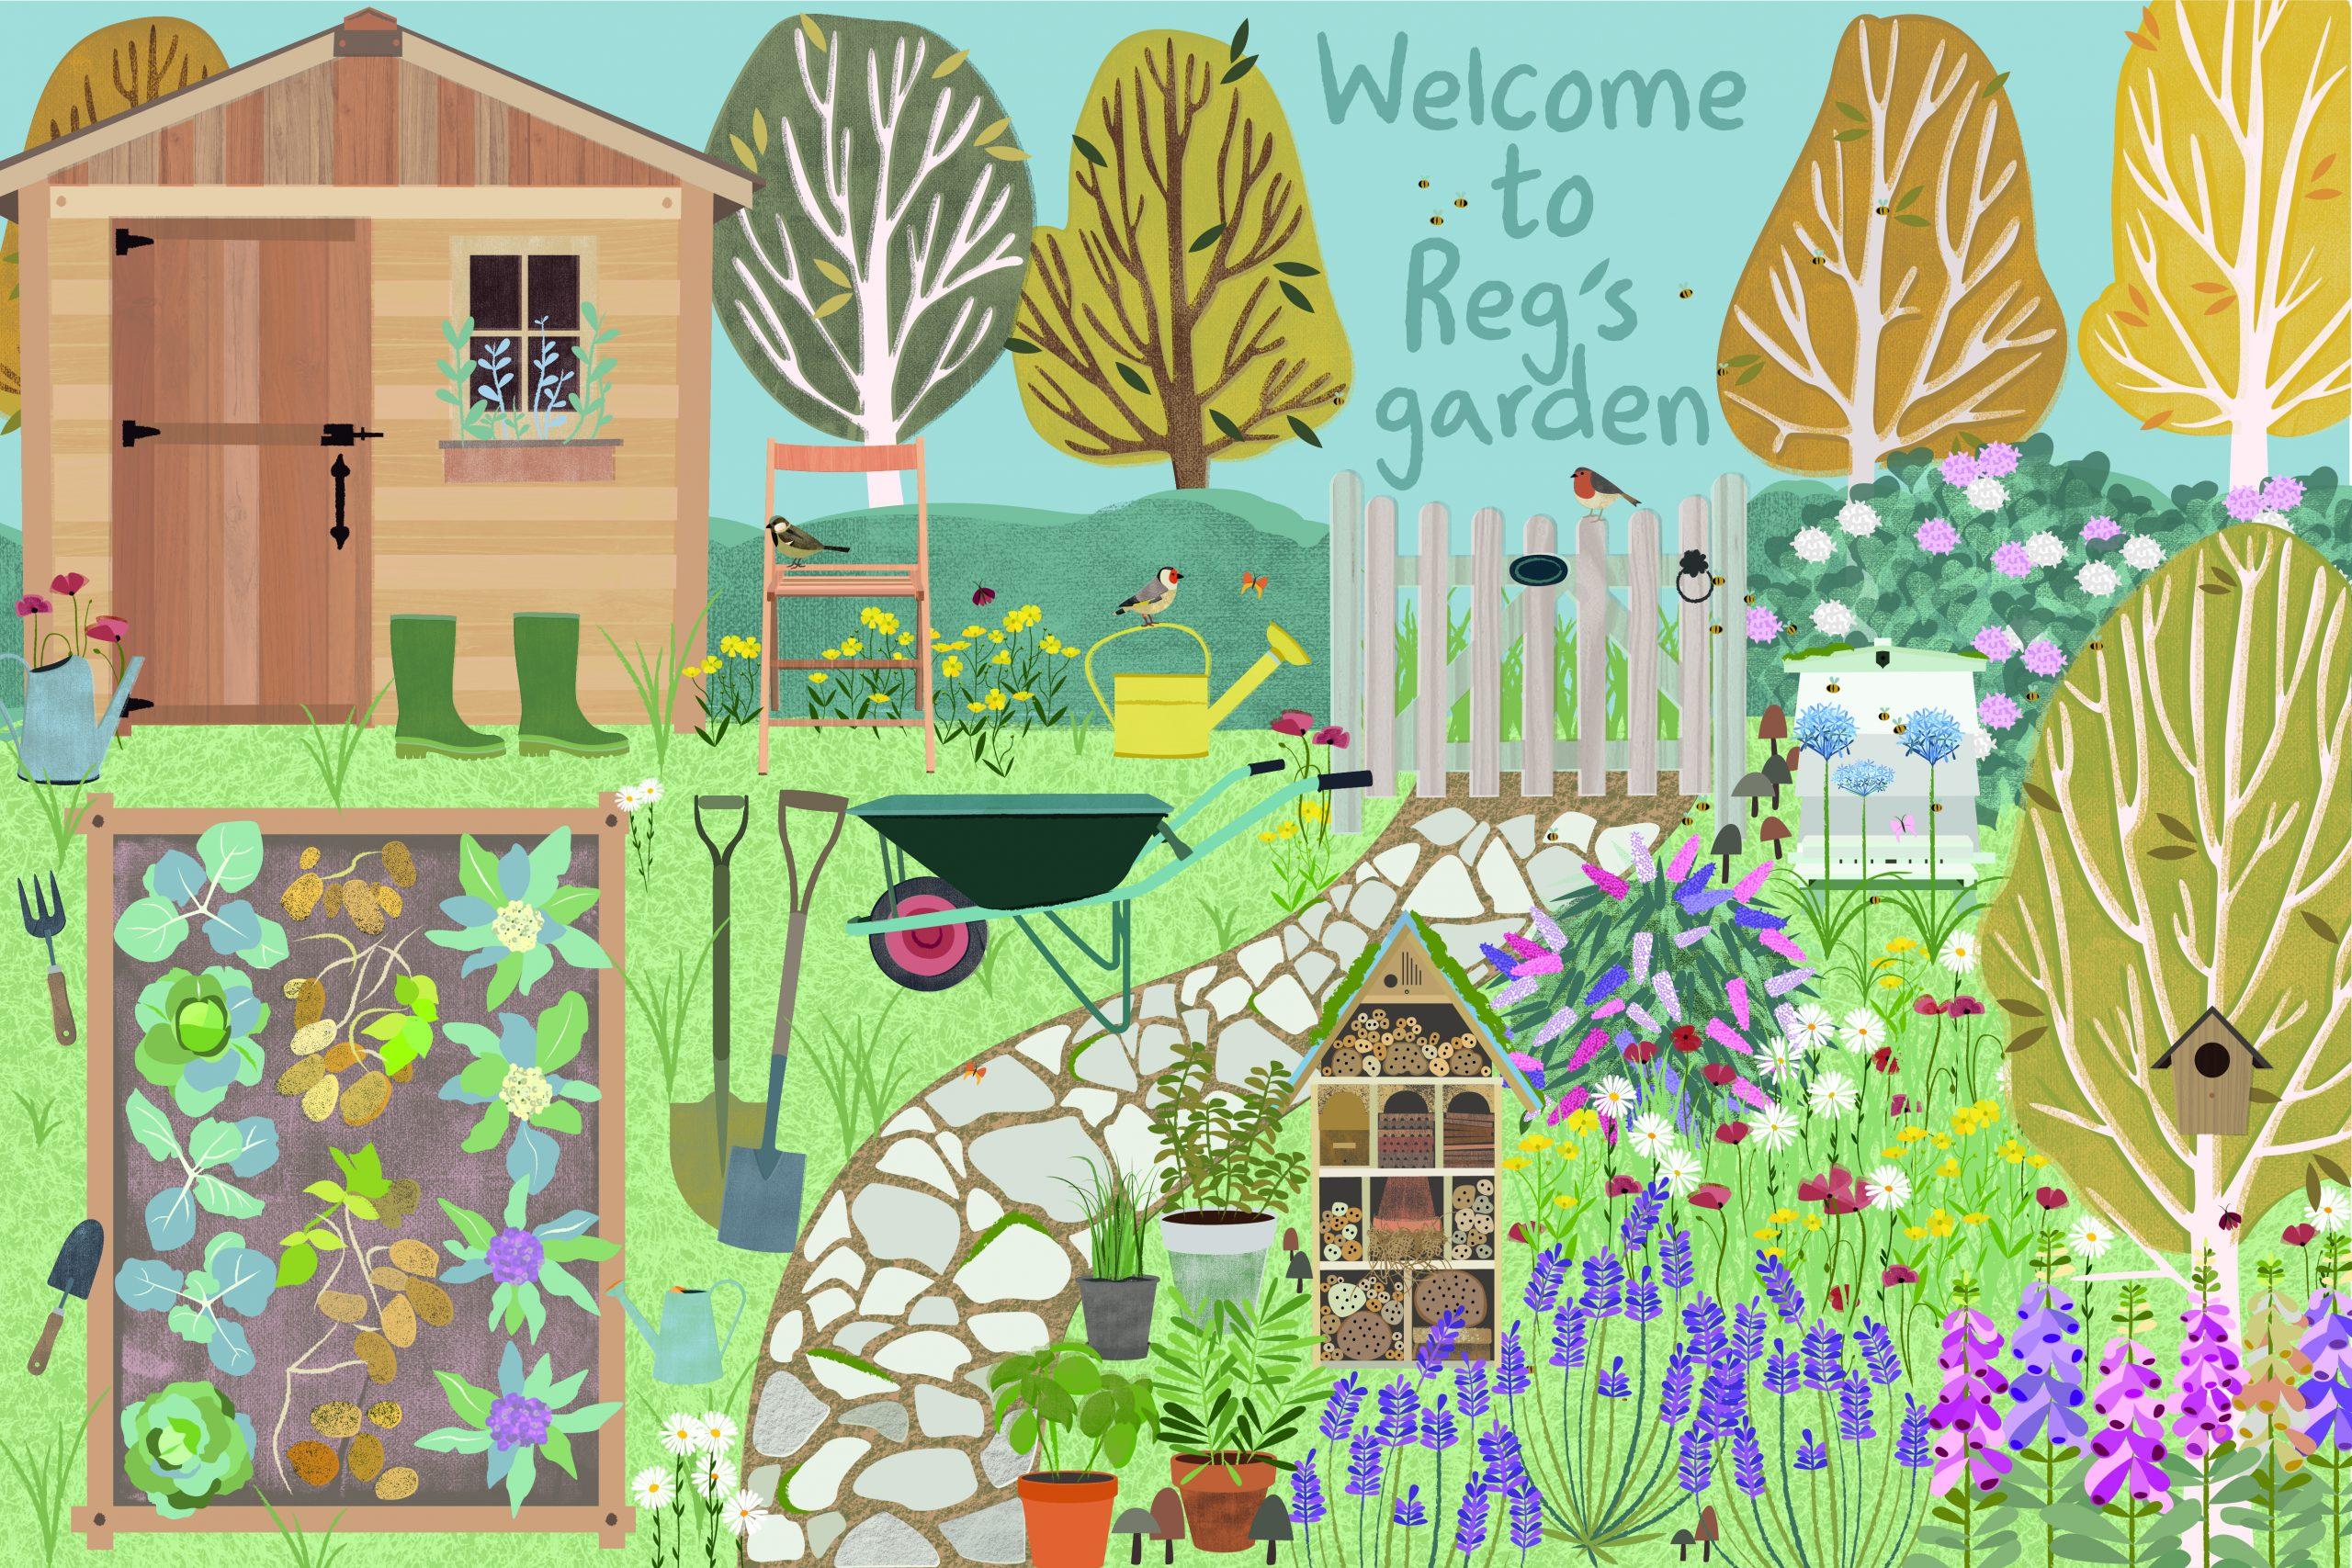 Reg's garden gate banner